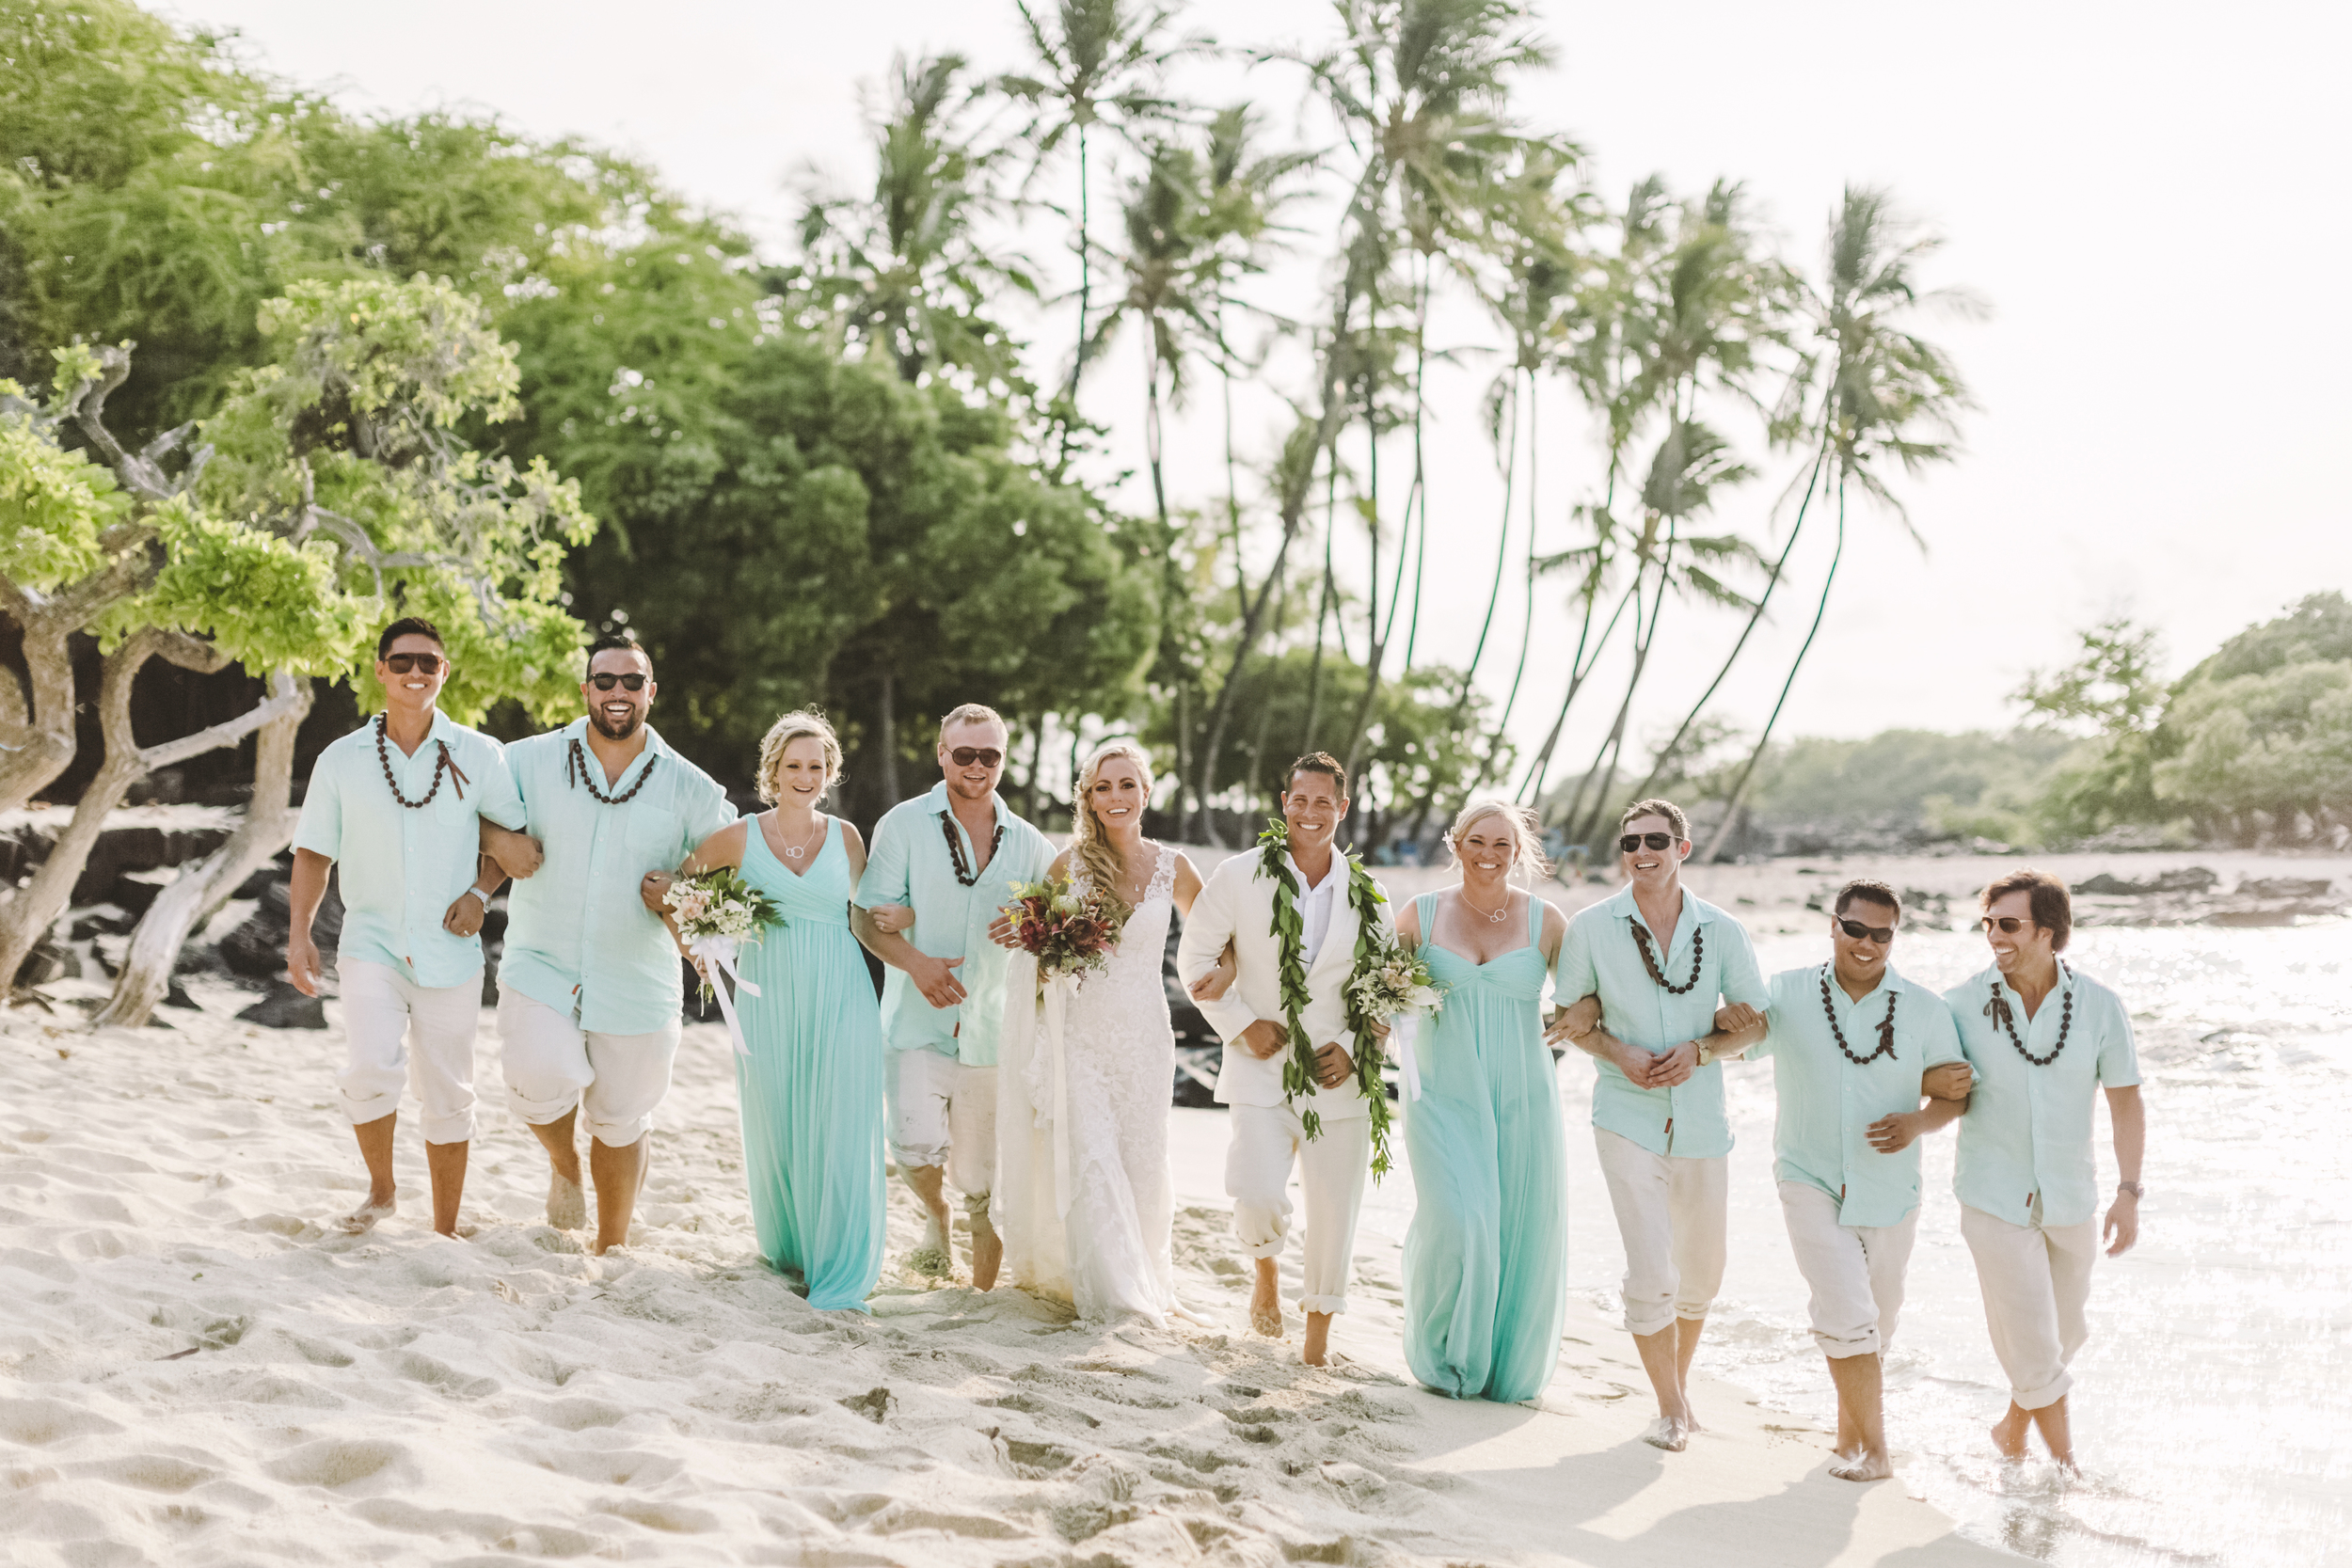 angie-diaz-photography-hawaii-wedding-photographer-kelli-jay-82.jpg